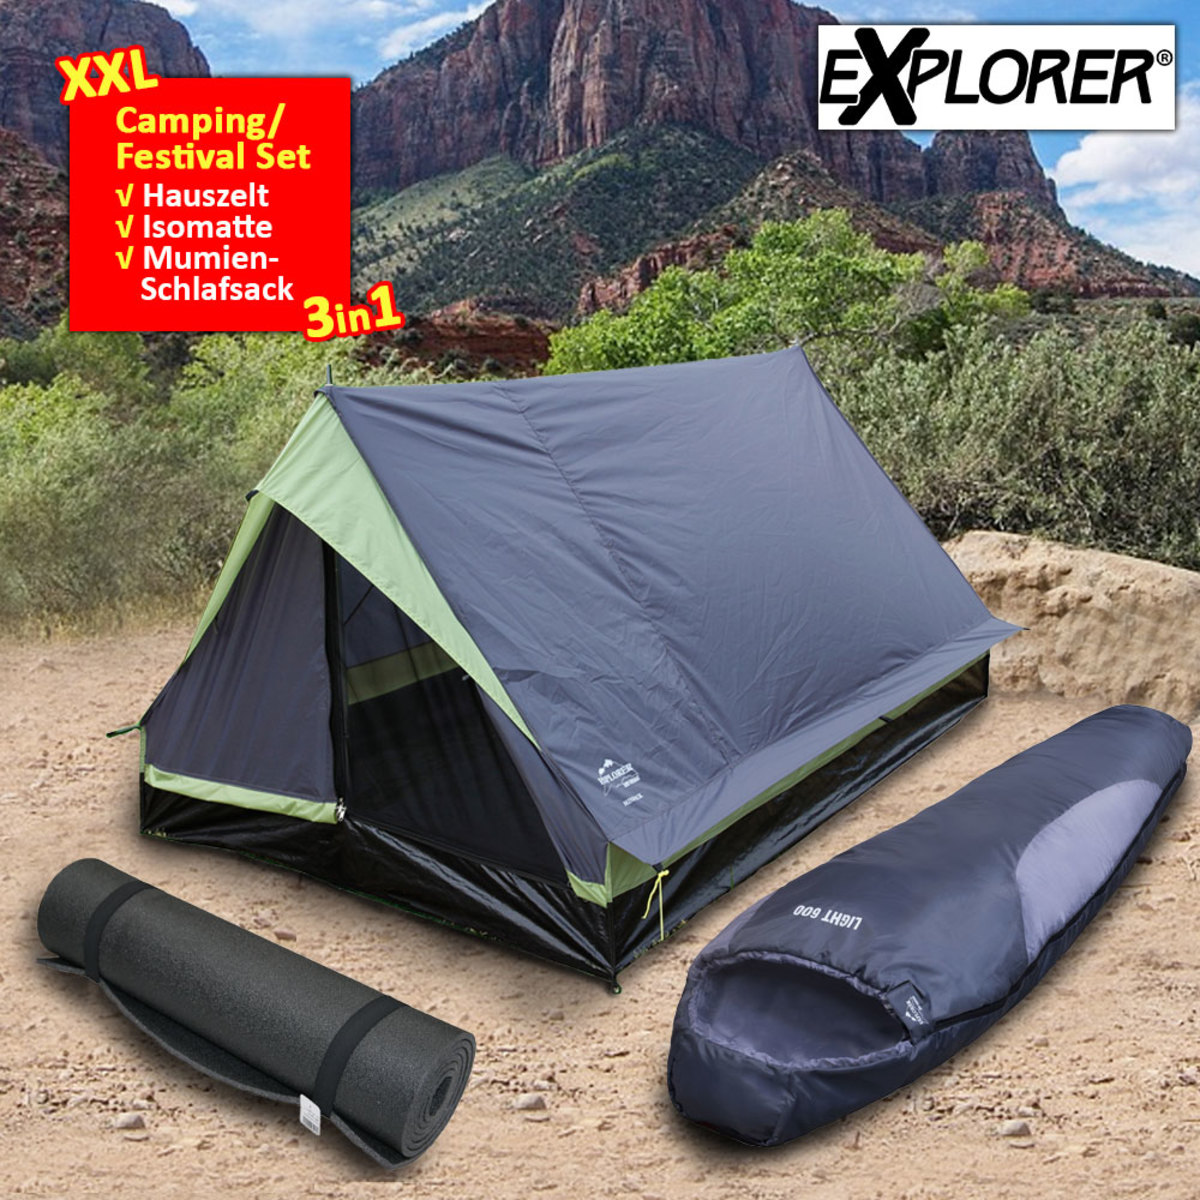 Bild 2 von Explorer Camping / Festival Set